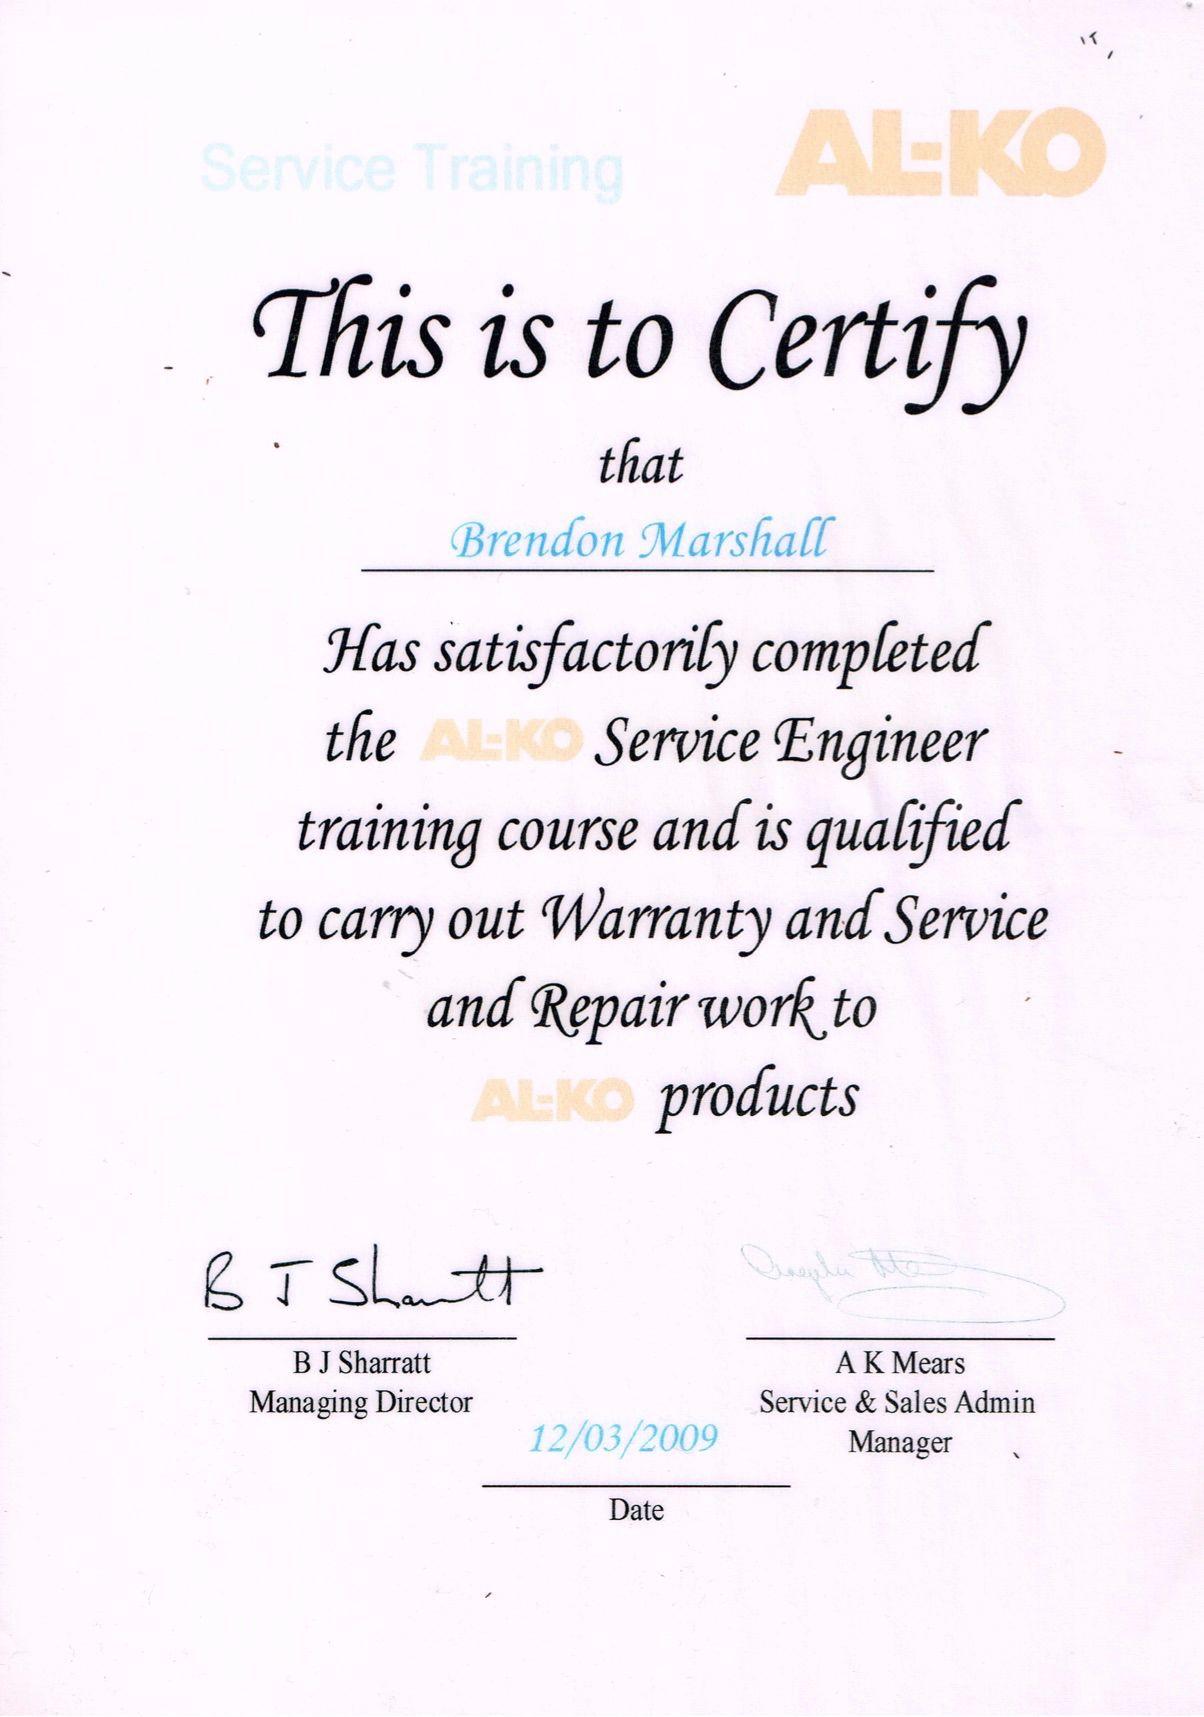 AL-Co Certificate